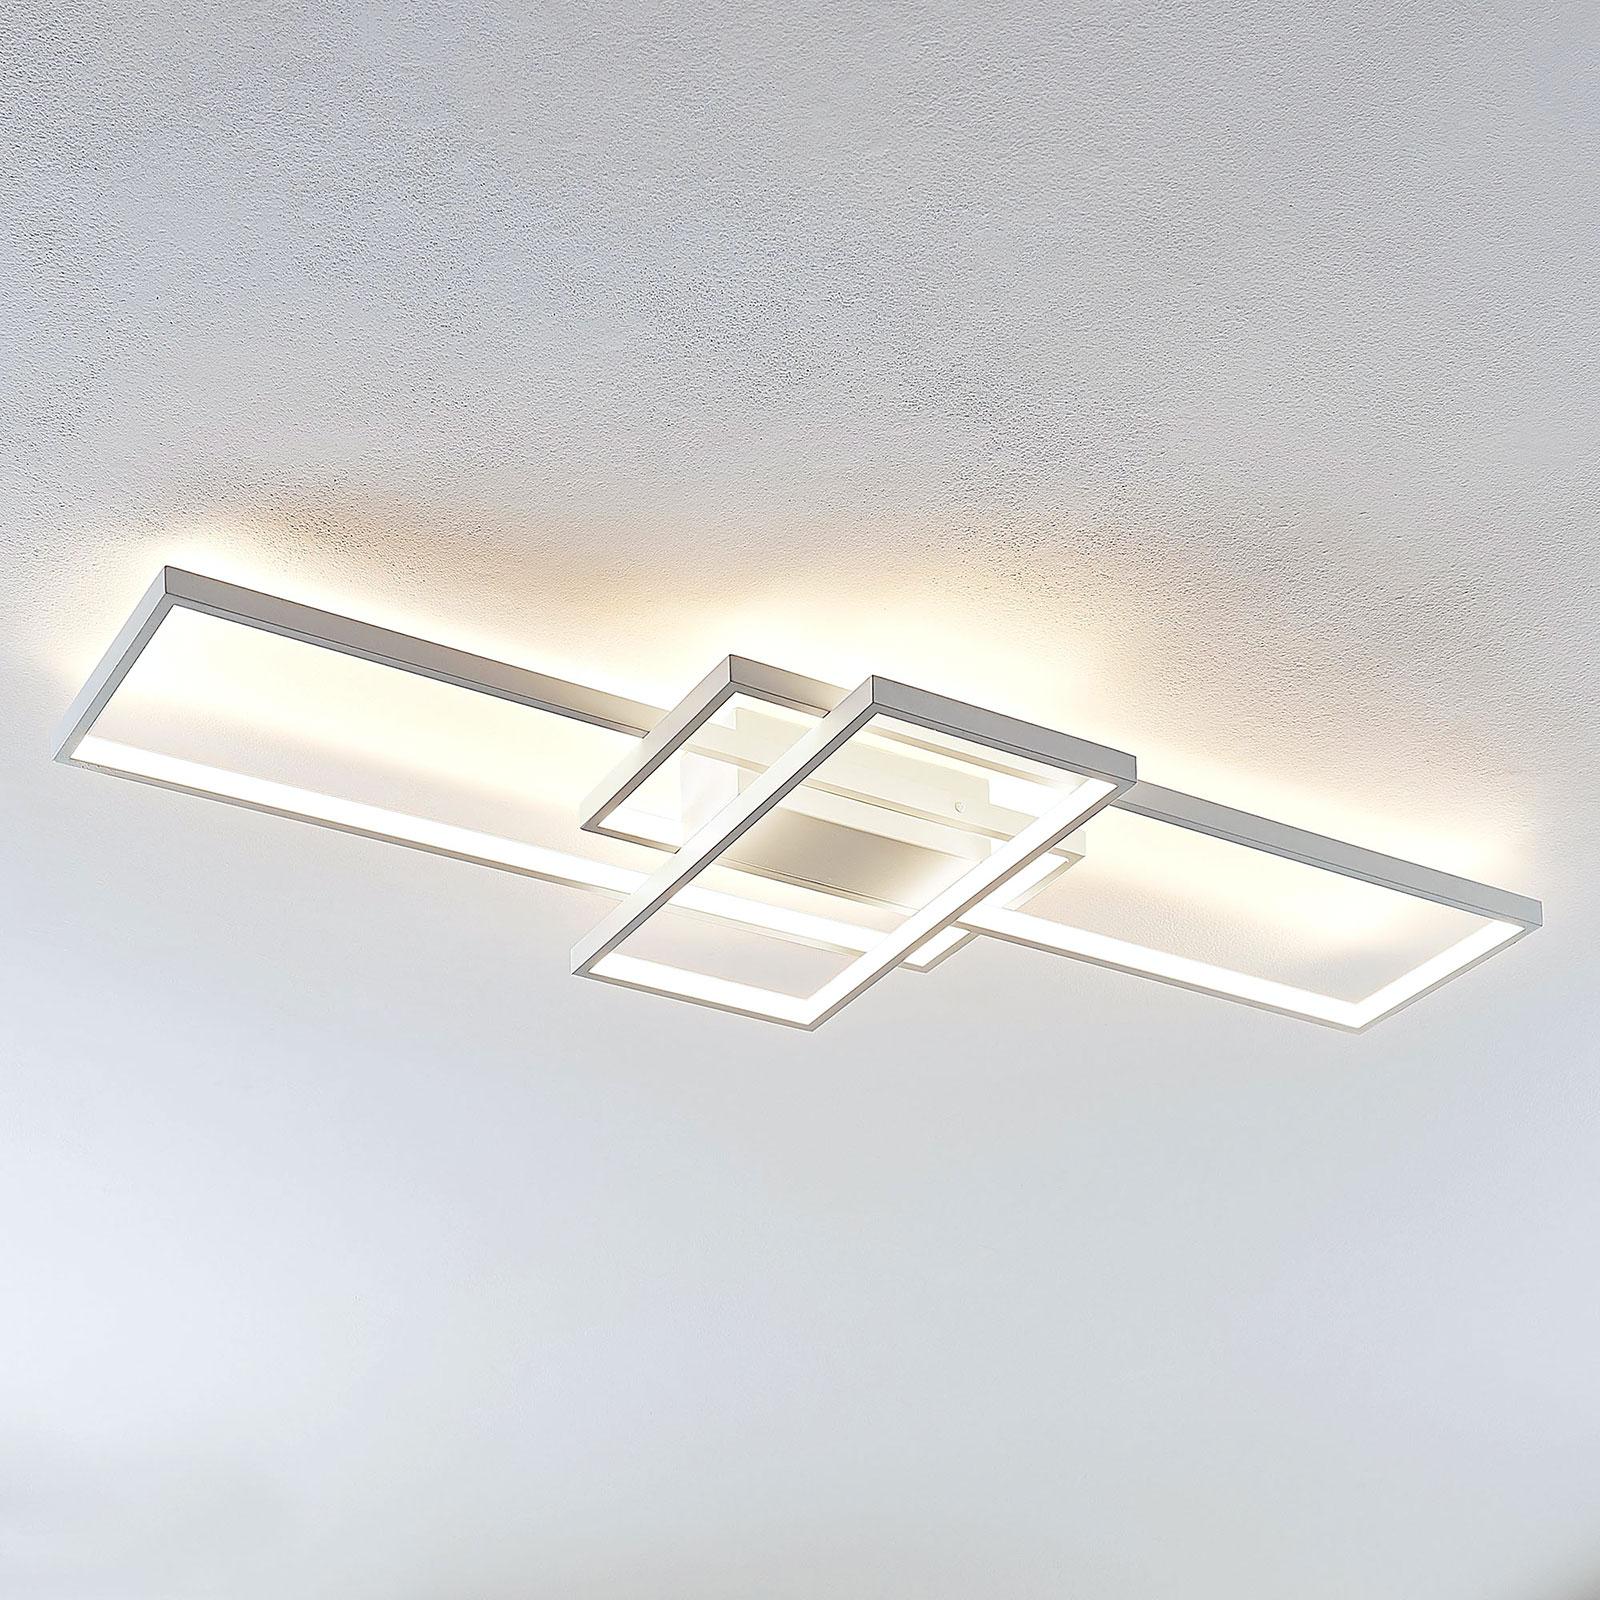 Lindby Poppy LED-taklampa med dimningsfunktion